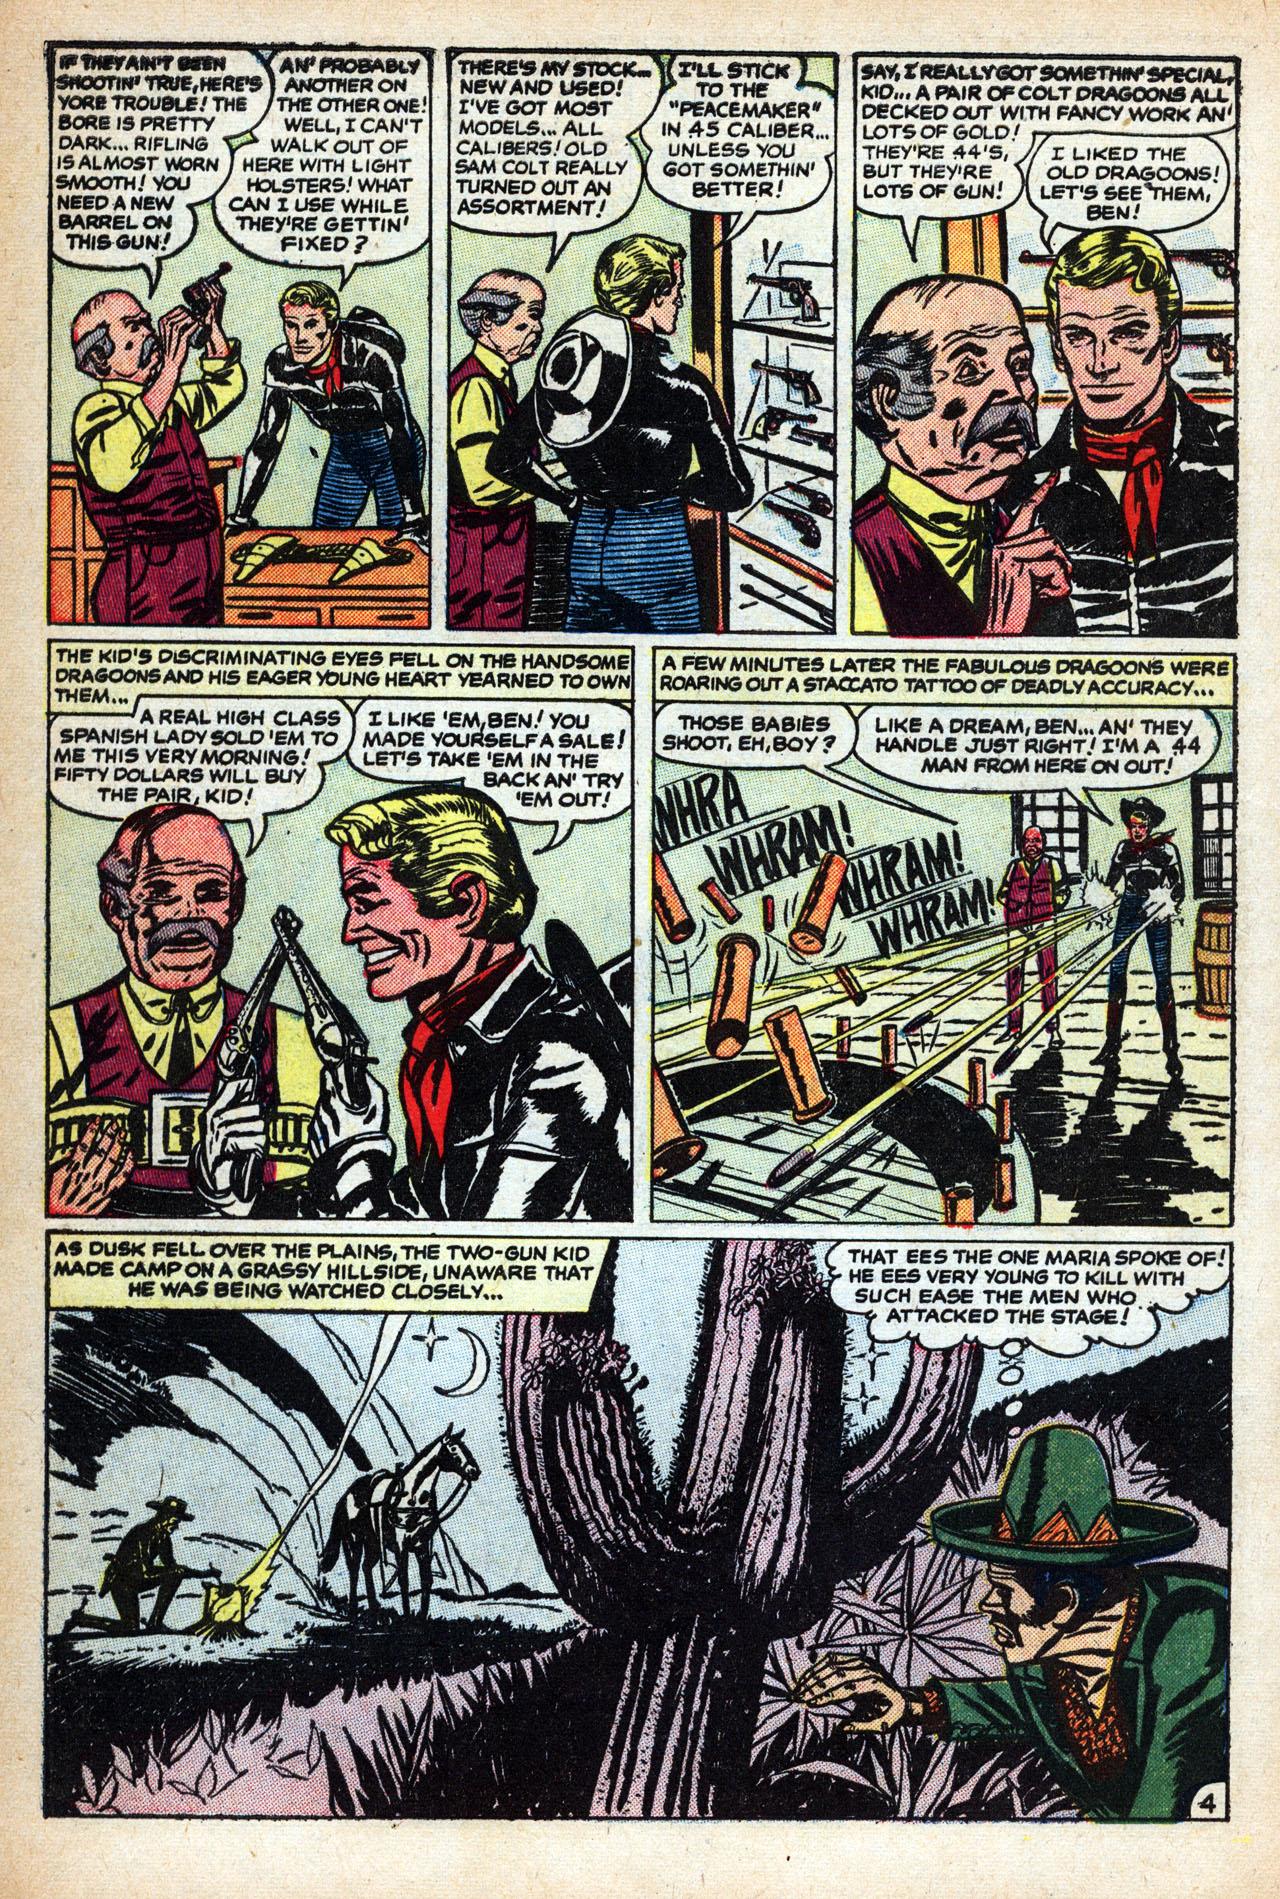 Read online Two-Gun Kid comic -  Issue #15 - 6